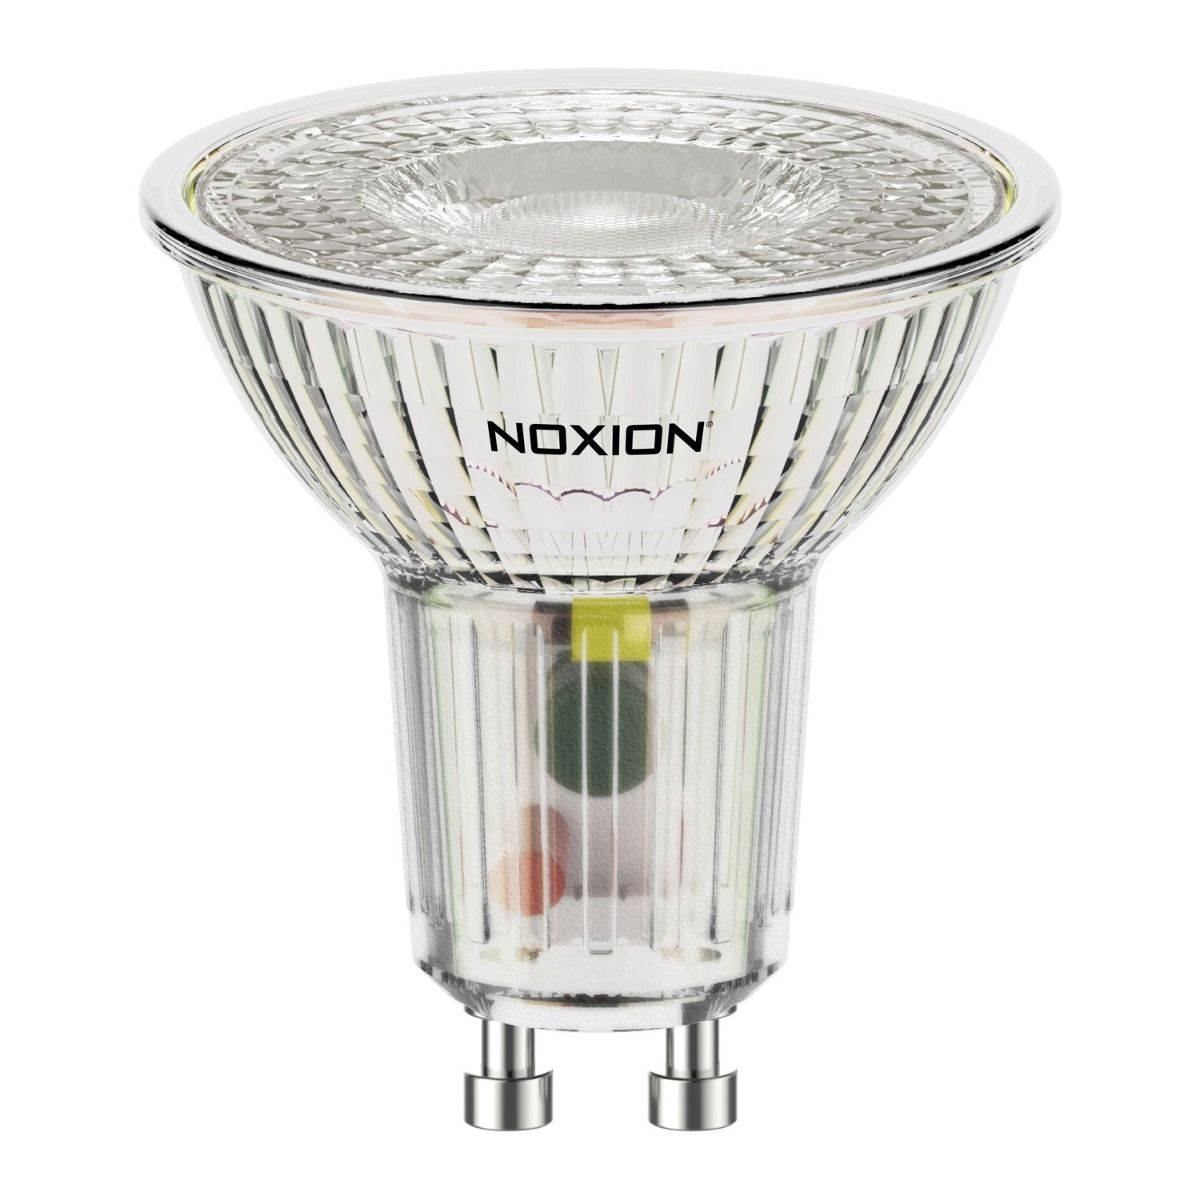 Noxion LED Spot GU10 3.7W 840 36D 270lm | Vervanger voor 35W